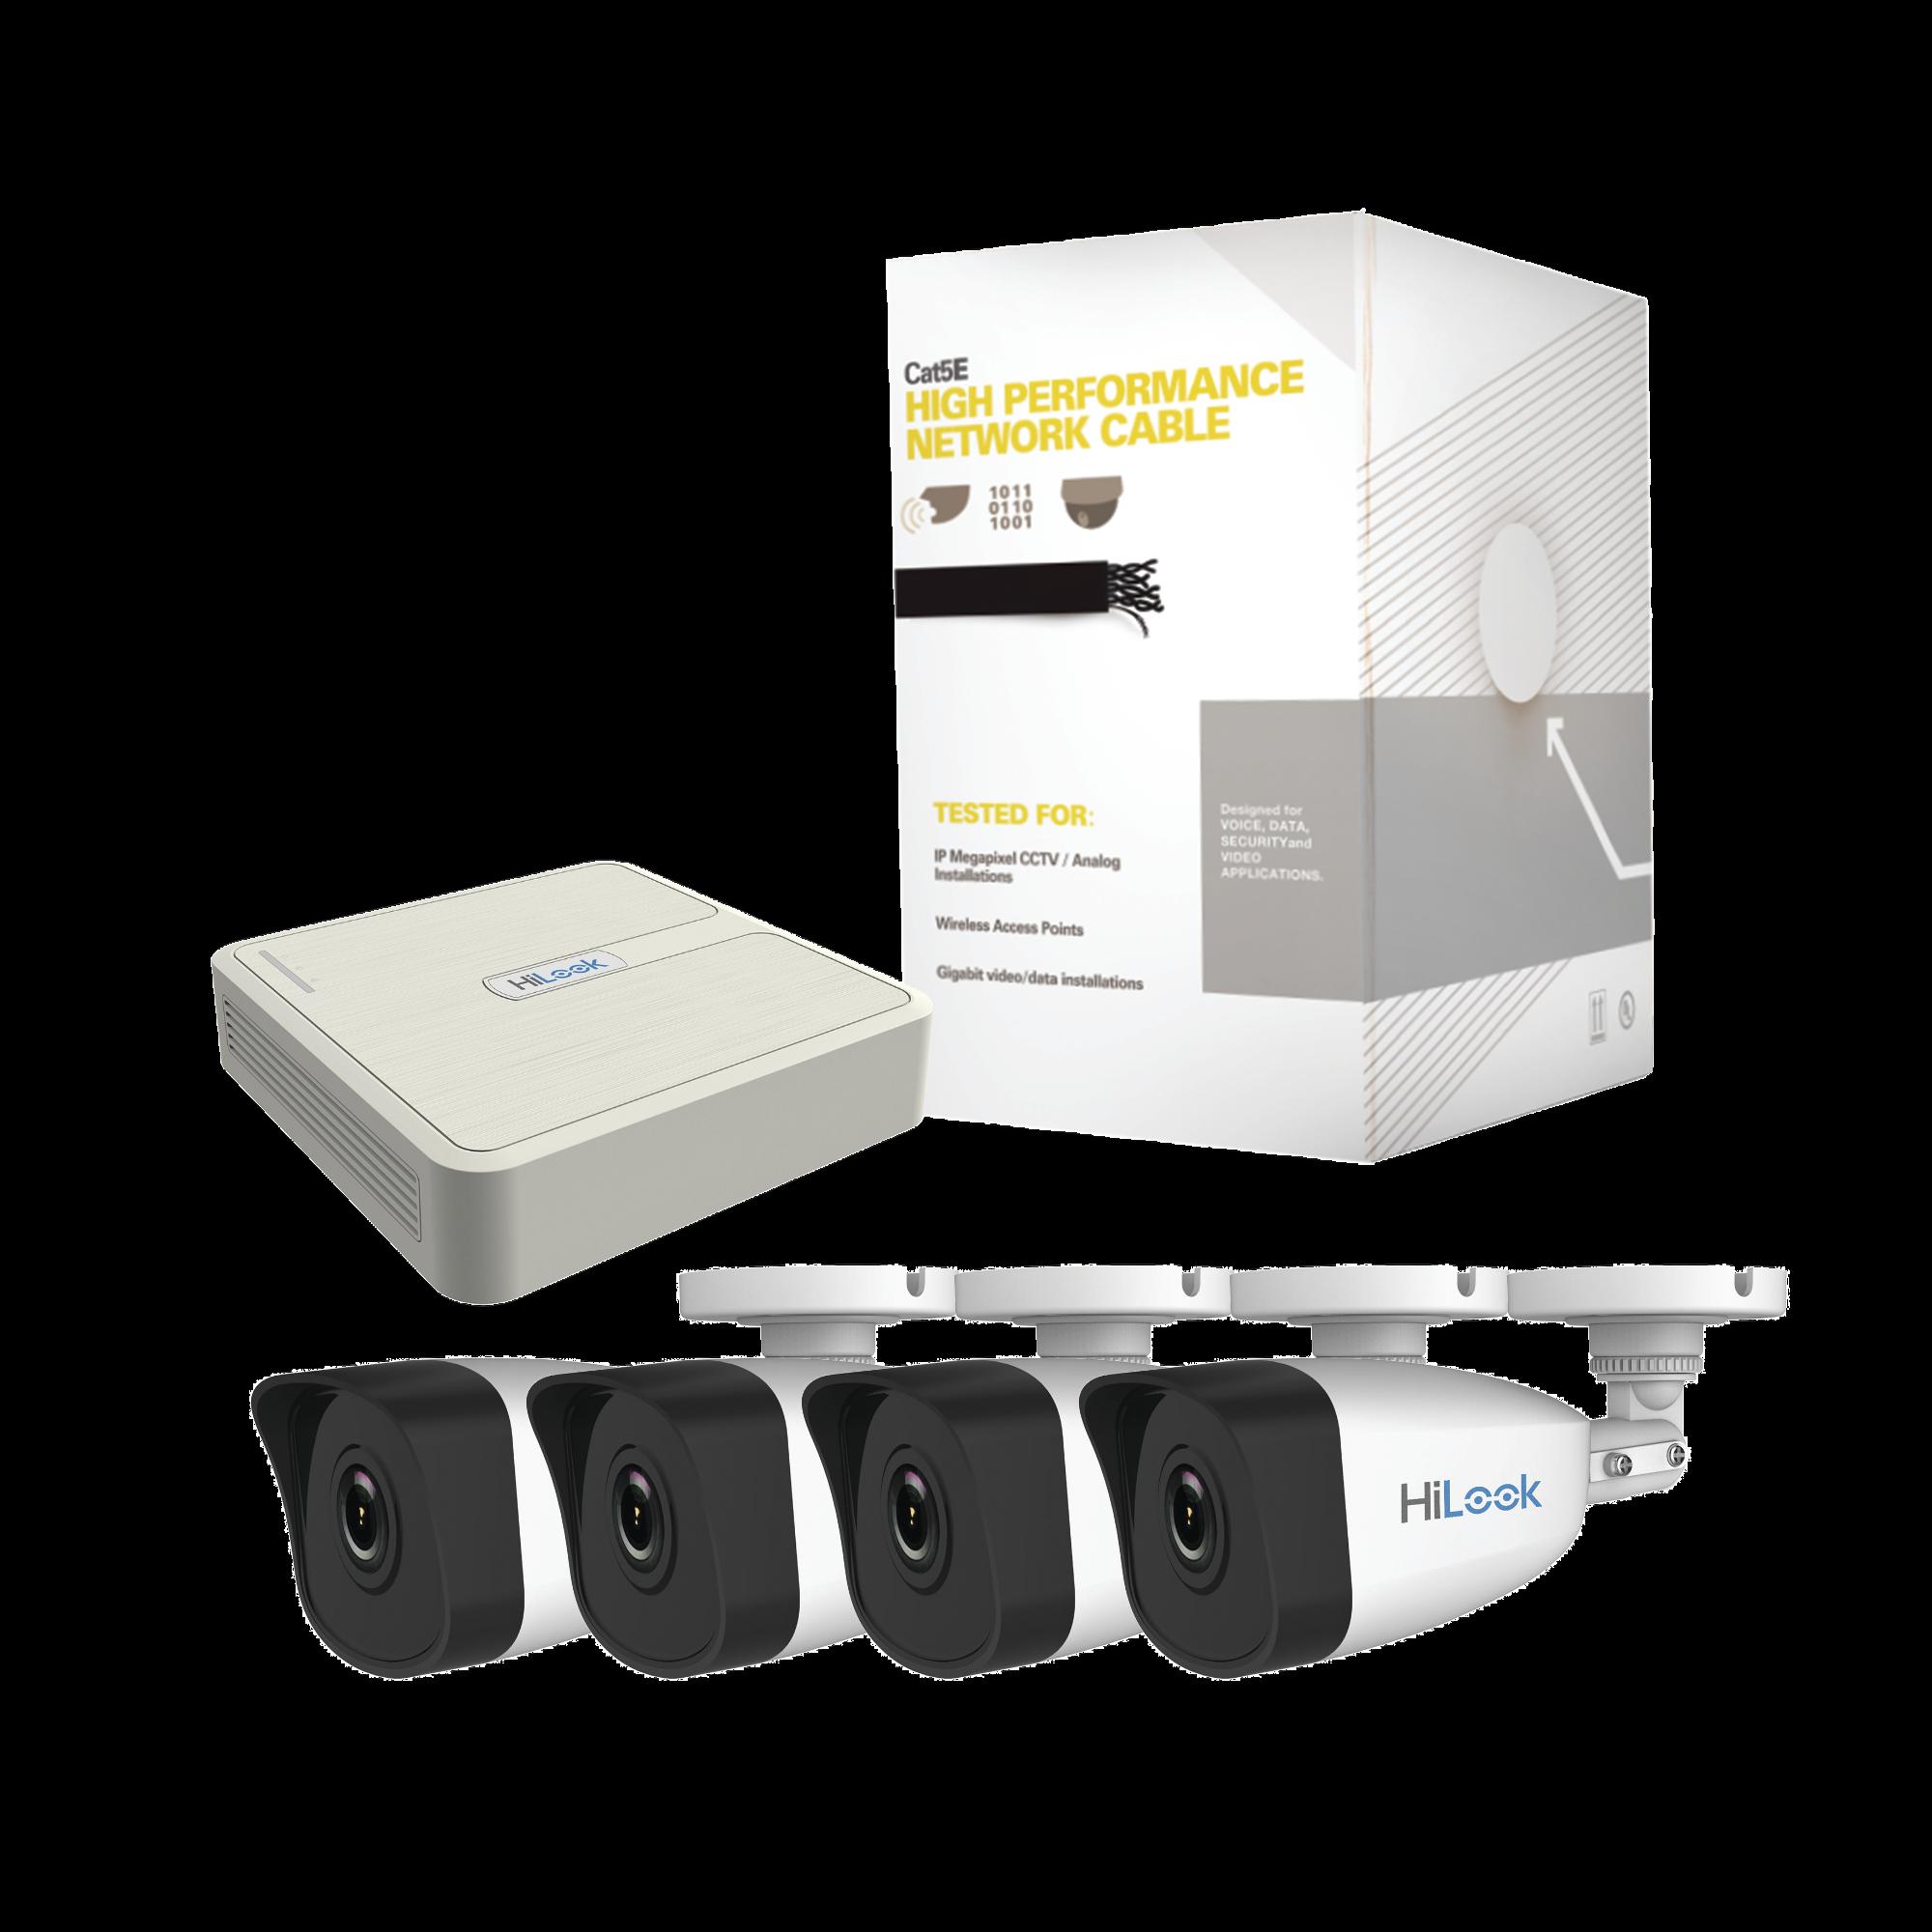 Kit IP de 4 Canales de 1 Megapixel / NVR de 4 Canales + 4 Cámaras IP + Bobina de Cable de 100 mts